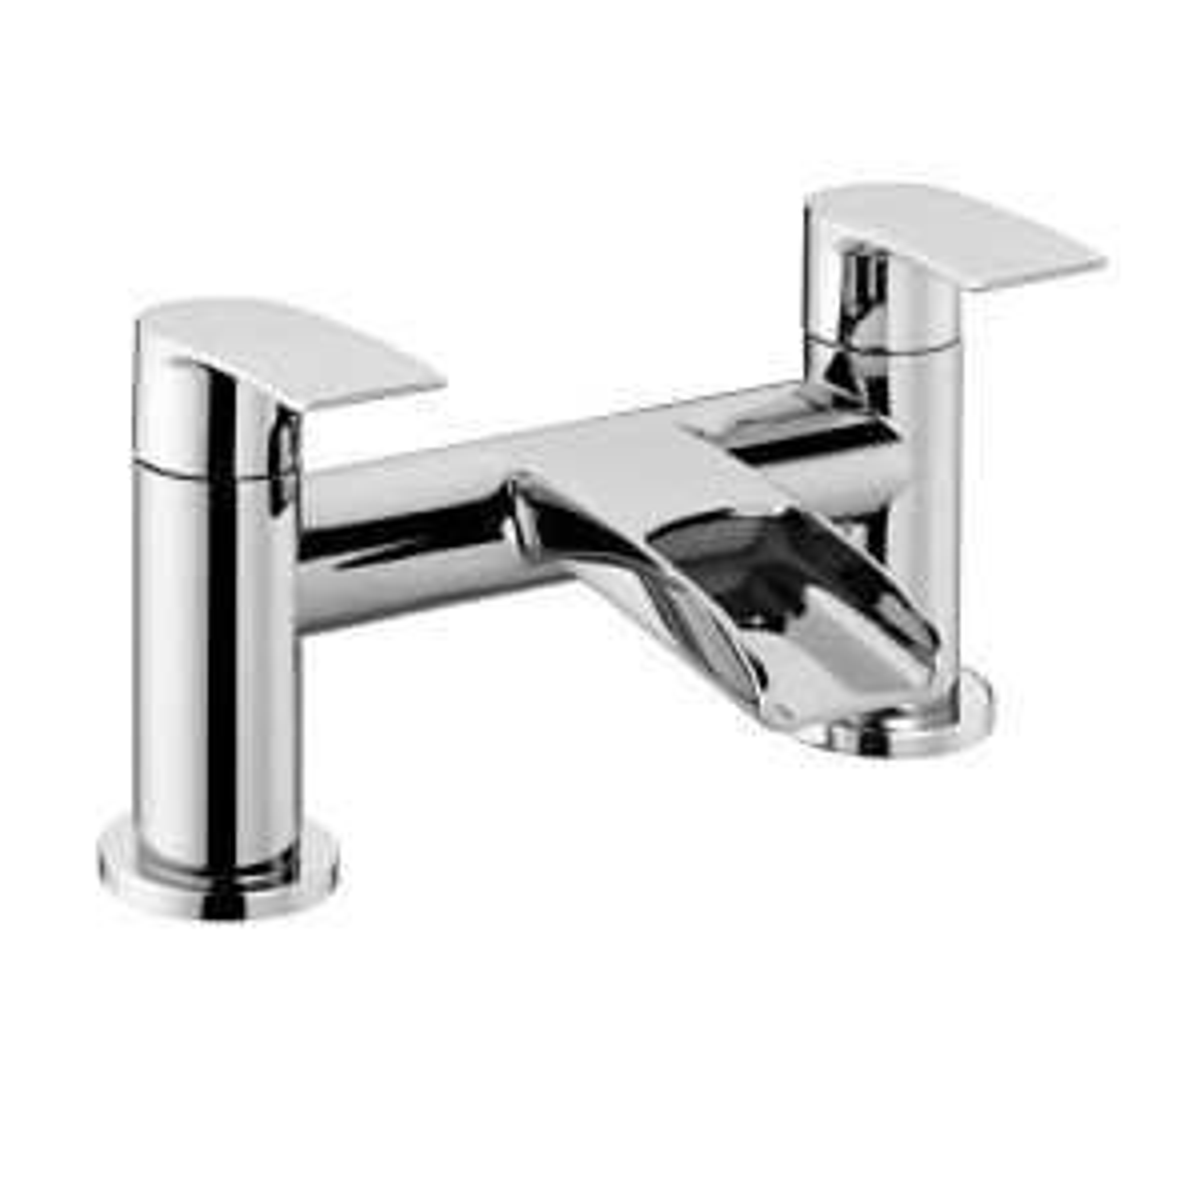 Frontline Flo Bath Filler Tap